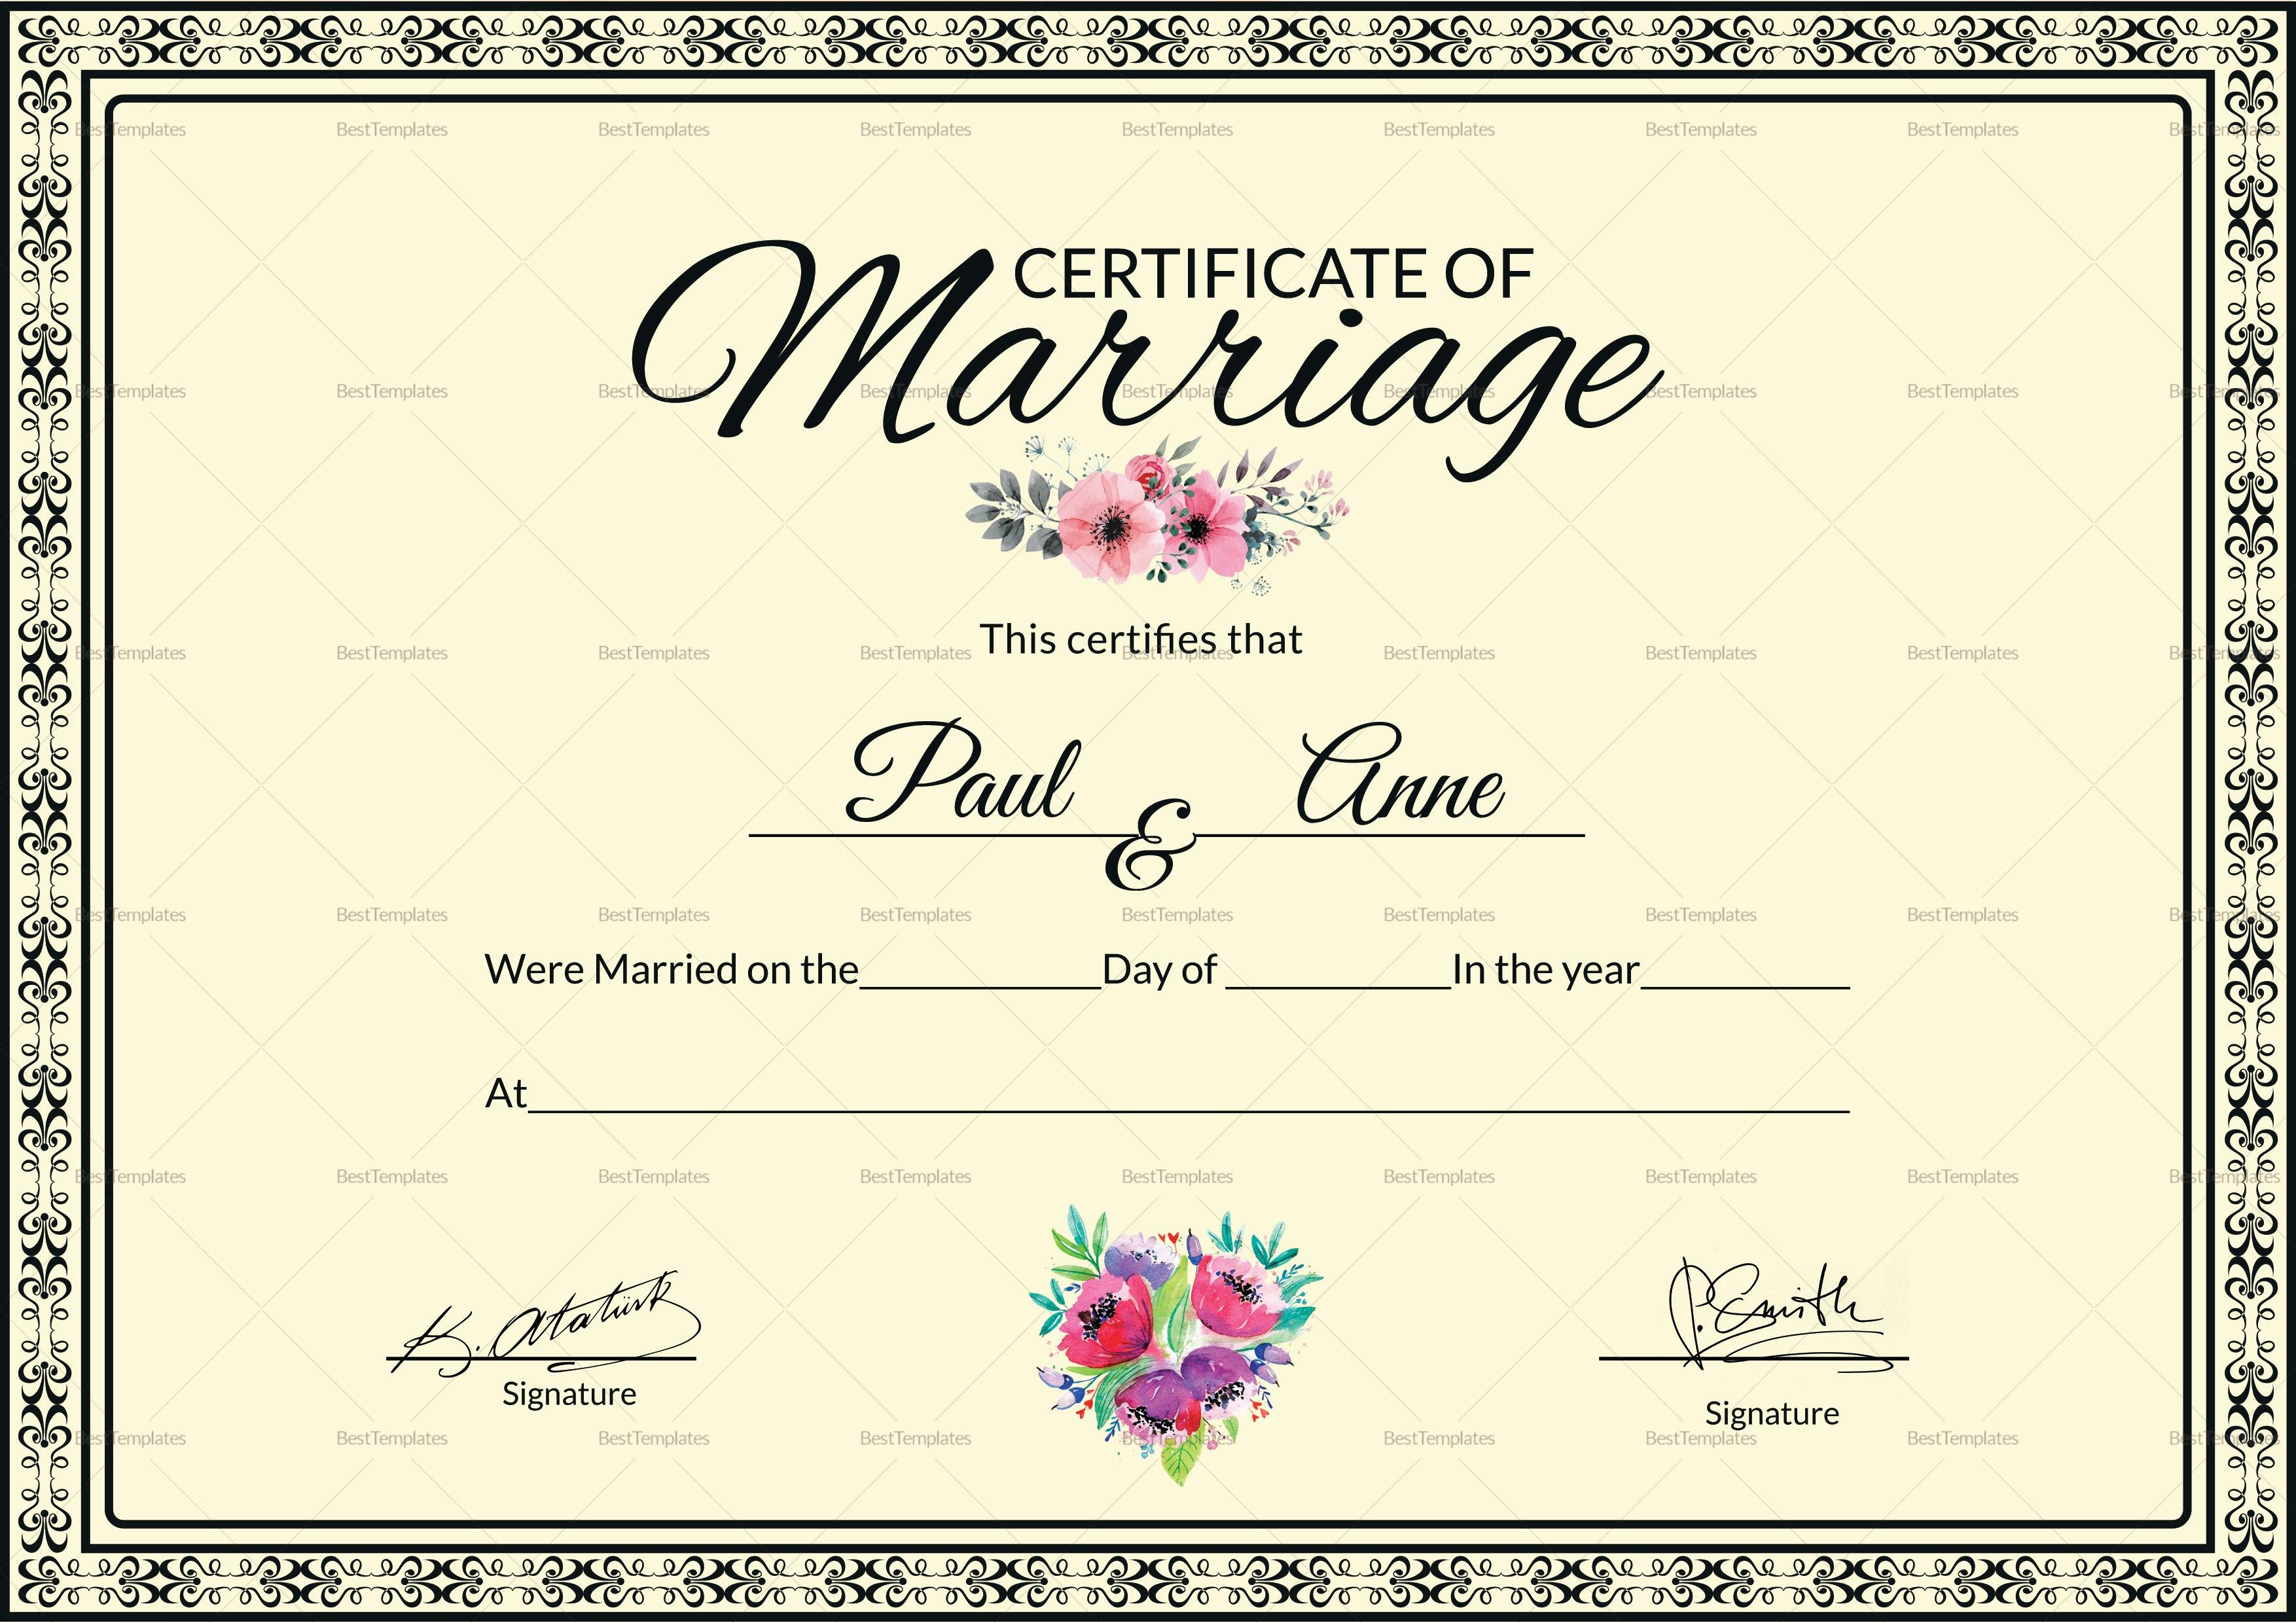 Marriage Certificate Design Template In Psd Word Pertaining To Certificate Of Marriage Template